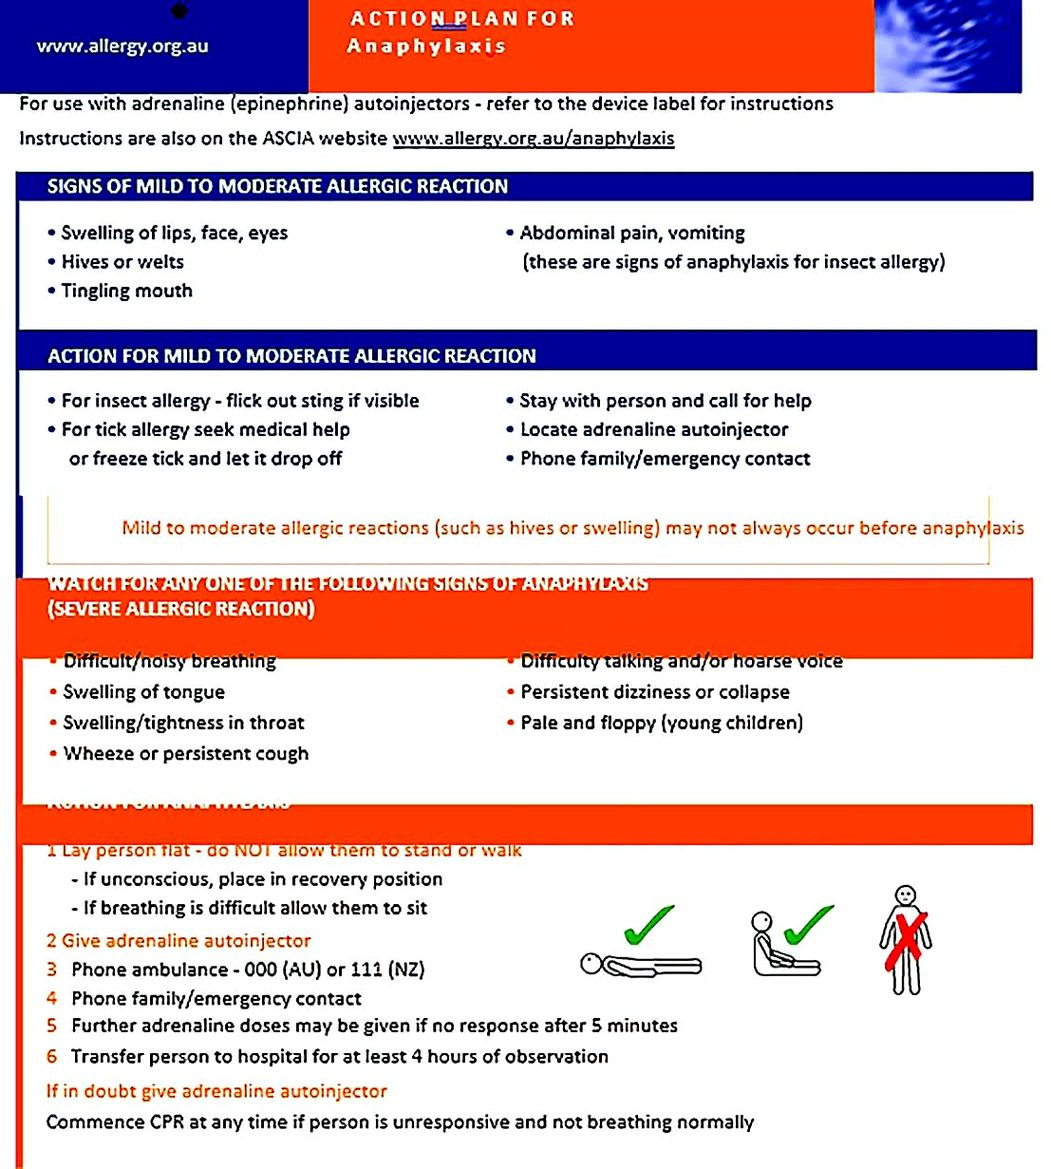 ASCIA Action Plan Anaphylaxis Generic Orange